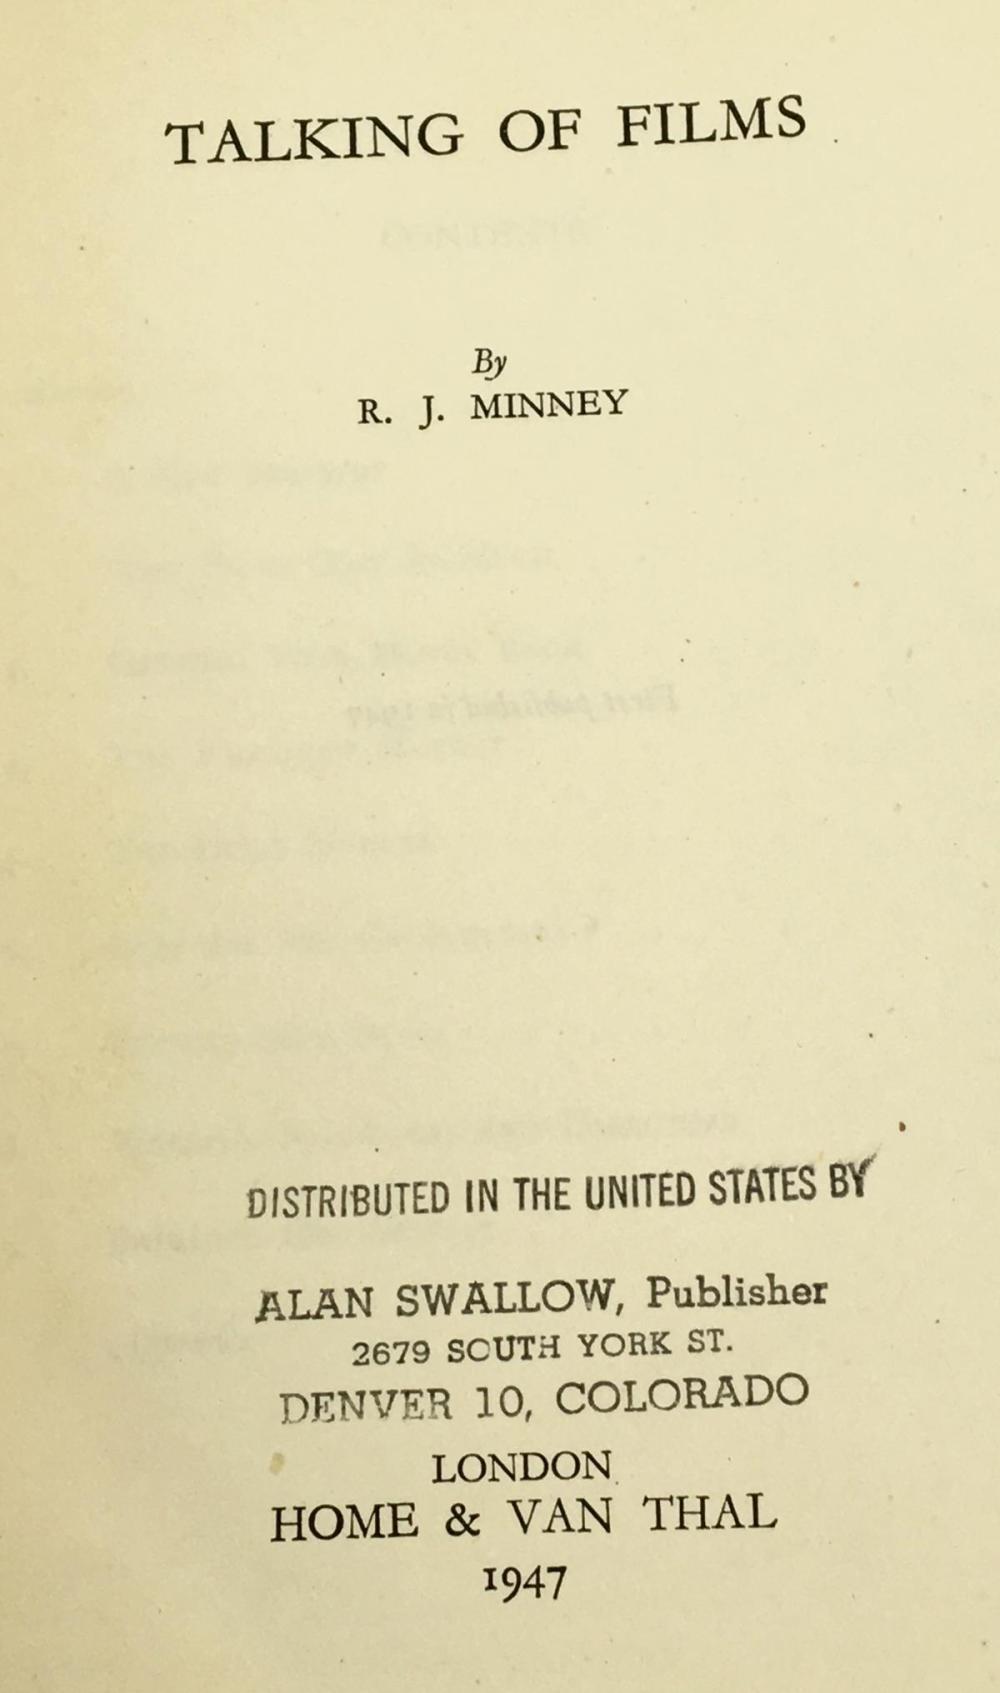 1947 Talking of Films by R.J. Minney w/ Dust Jacket FIRST EDITION